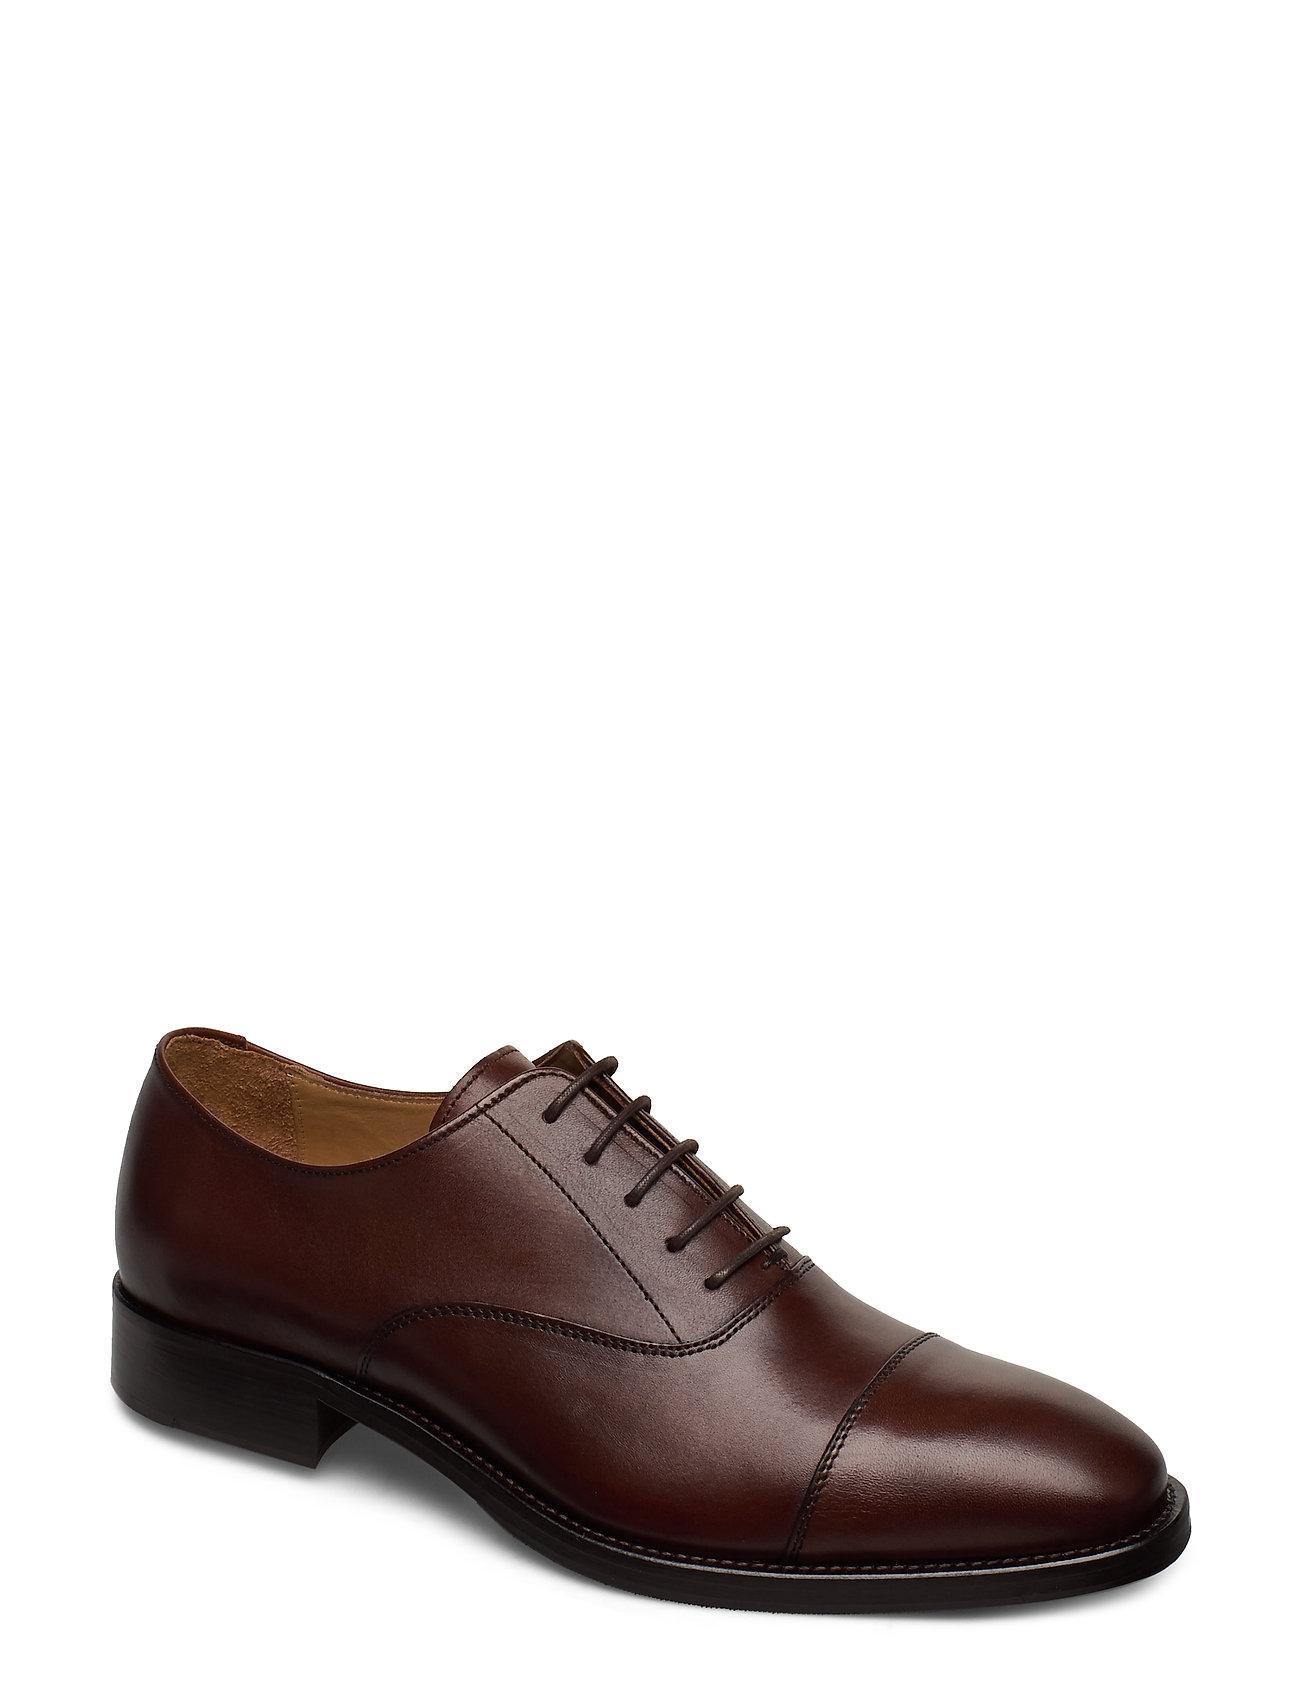 J. Lindeberg Hopper Cap Toe-Genuine Leather - BROWN